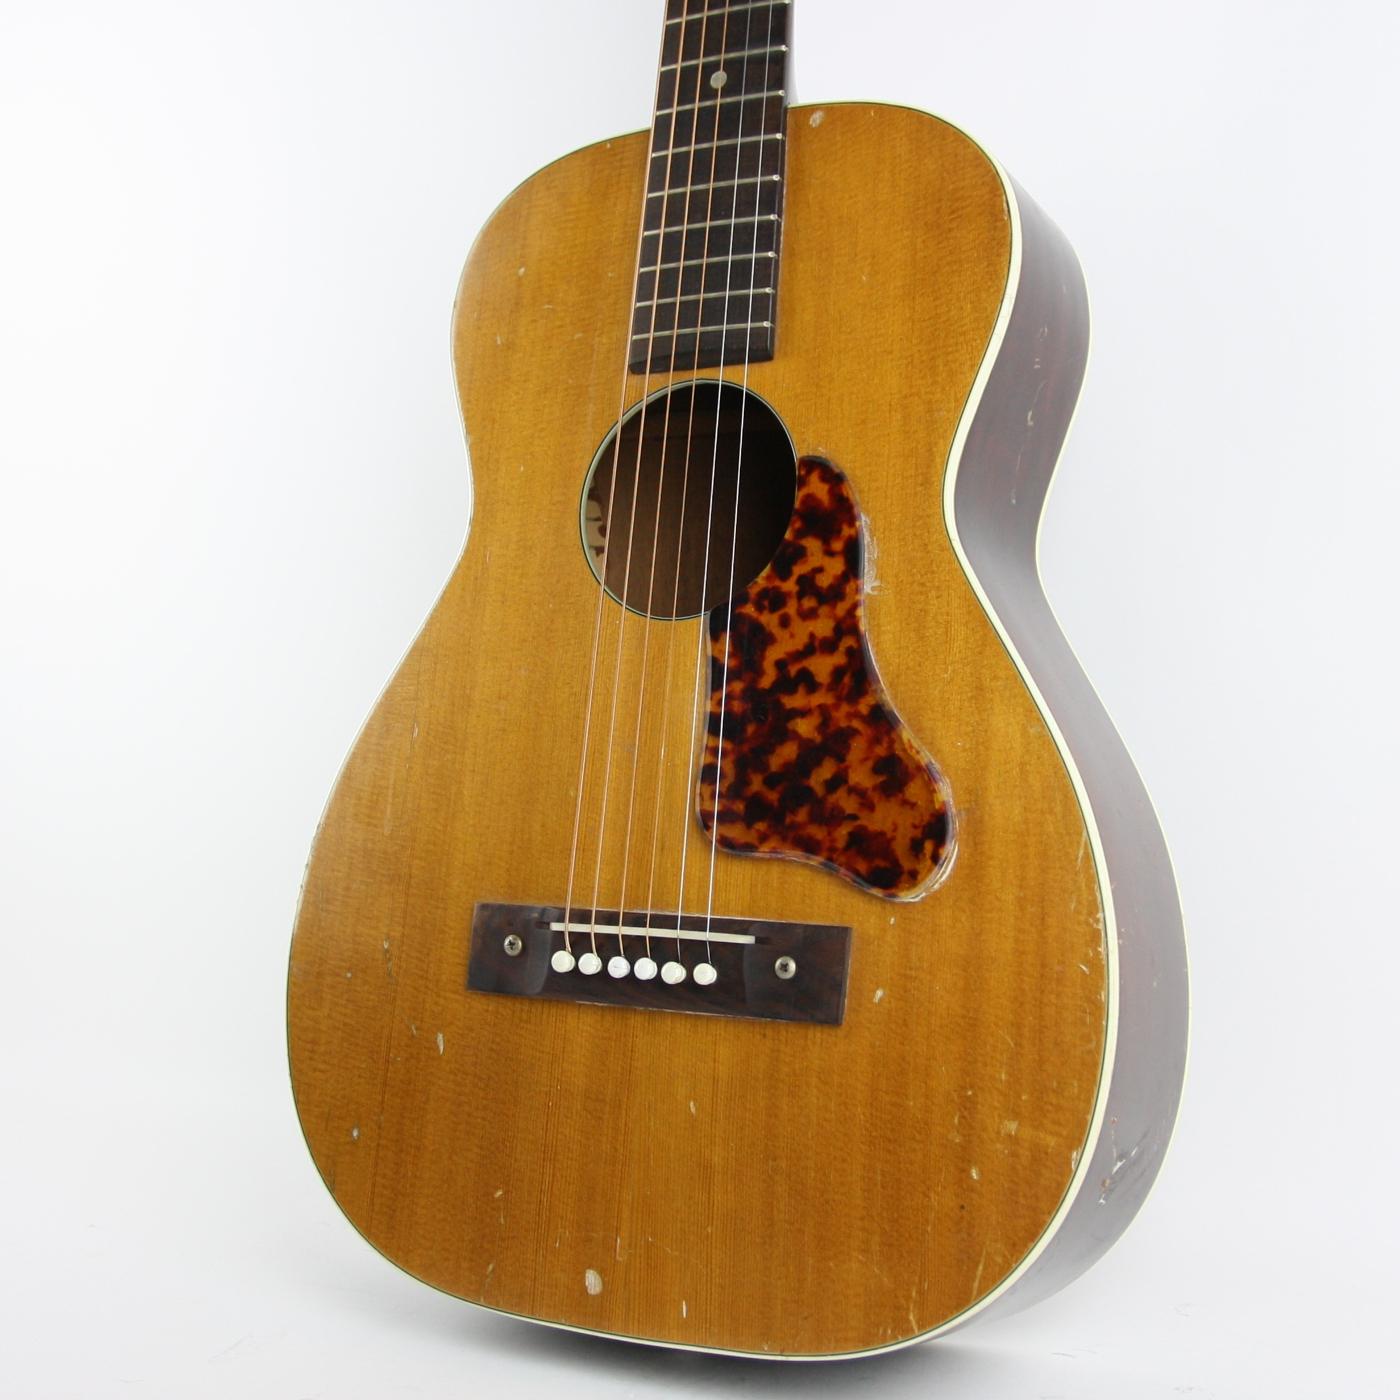 1960s Regal/Harmony Parlor Acoustic detail 0